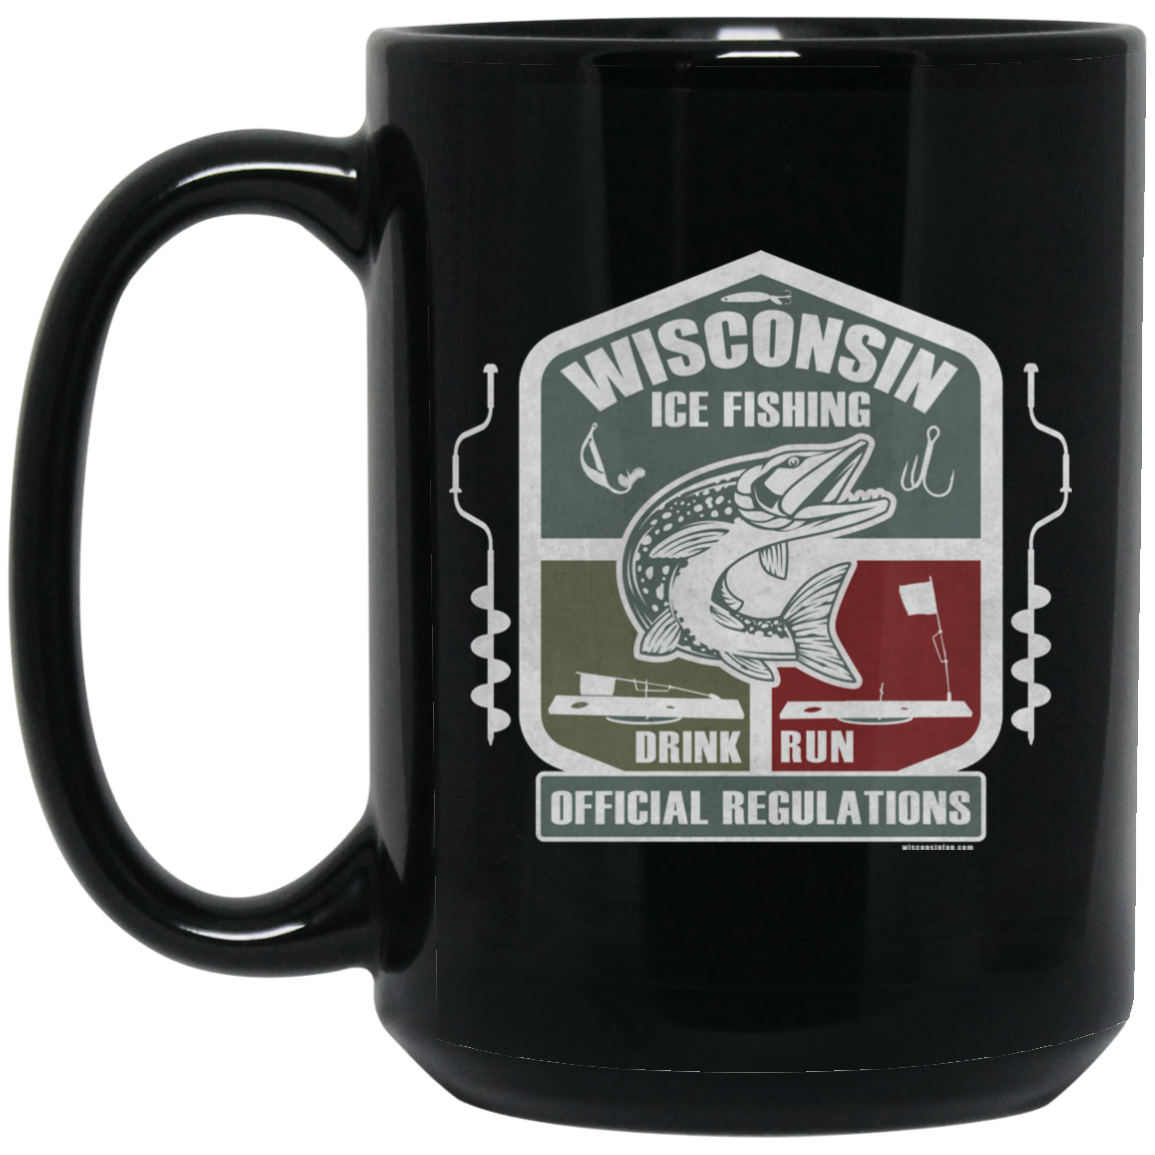 Wisconsin Ice Fishing Official Regulations Coffee Mug